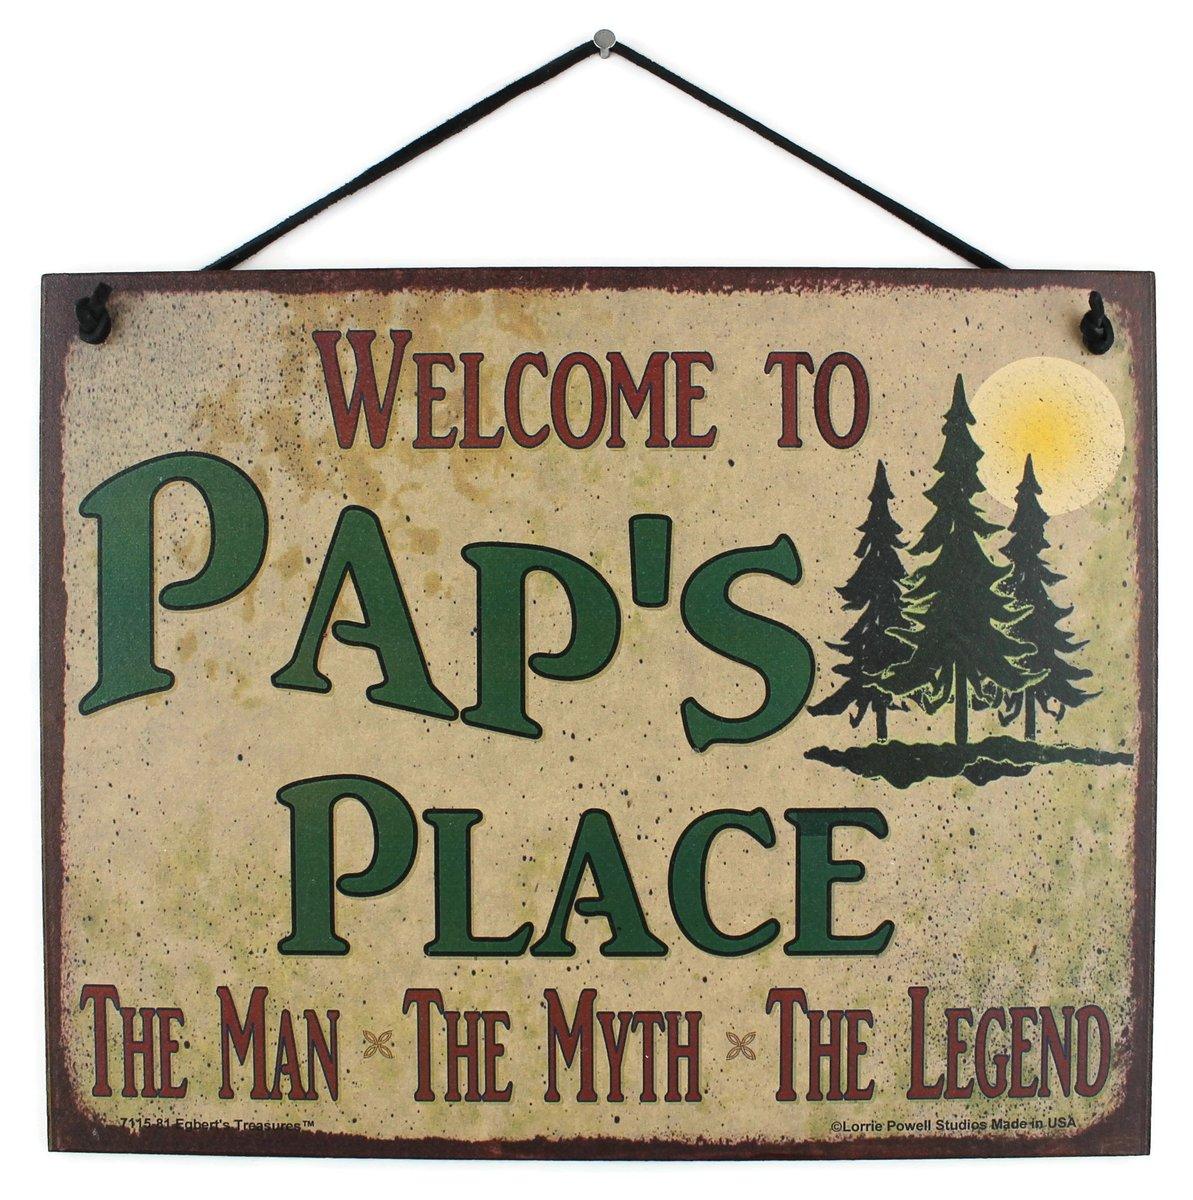 Good ol' Pap.  He's pretty dang cool.  Get this sign for Grandpa here: https://www.amazon.com/dp/B00IEOUKOK  #Pap #Grandpa #GiftsForHim #CoolGrandpa #GiftIdeas #GiftsForGrandpa #GiftIdeas #Seniors #Love #Family #ManMythLegend #Dad #Grandfather #Grandparents #EgbertsTreasurespic.twitter.com/cdO0aWkZ0T